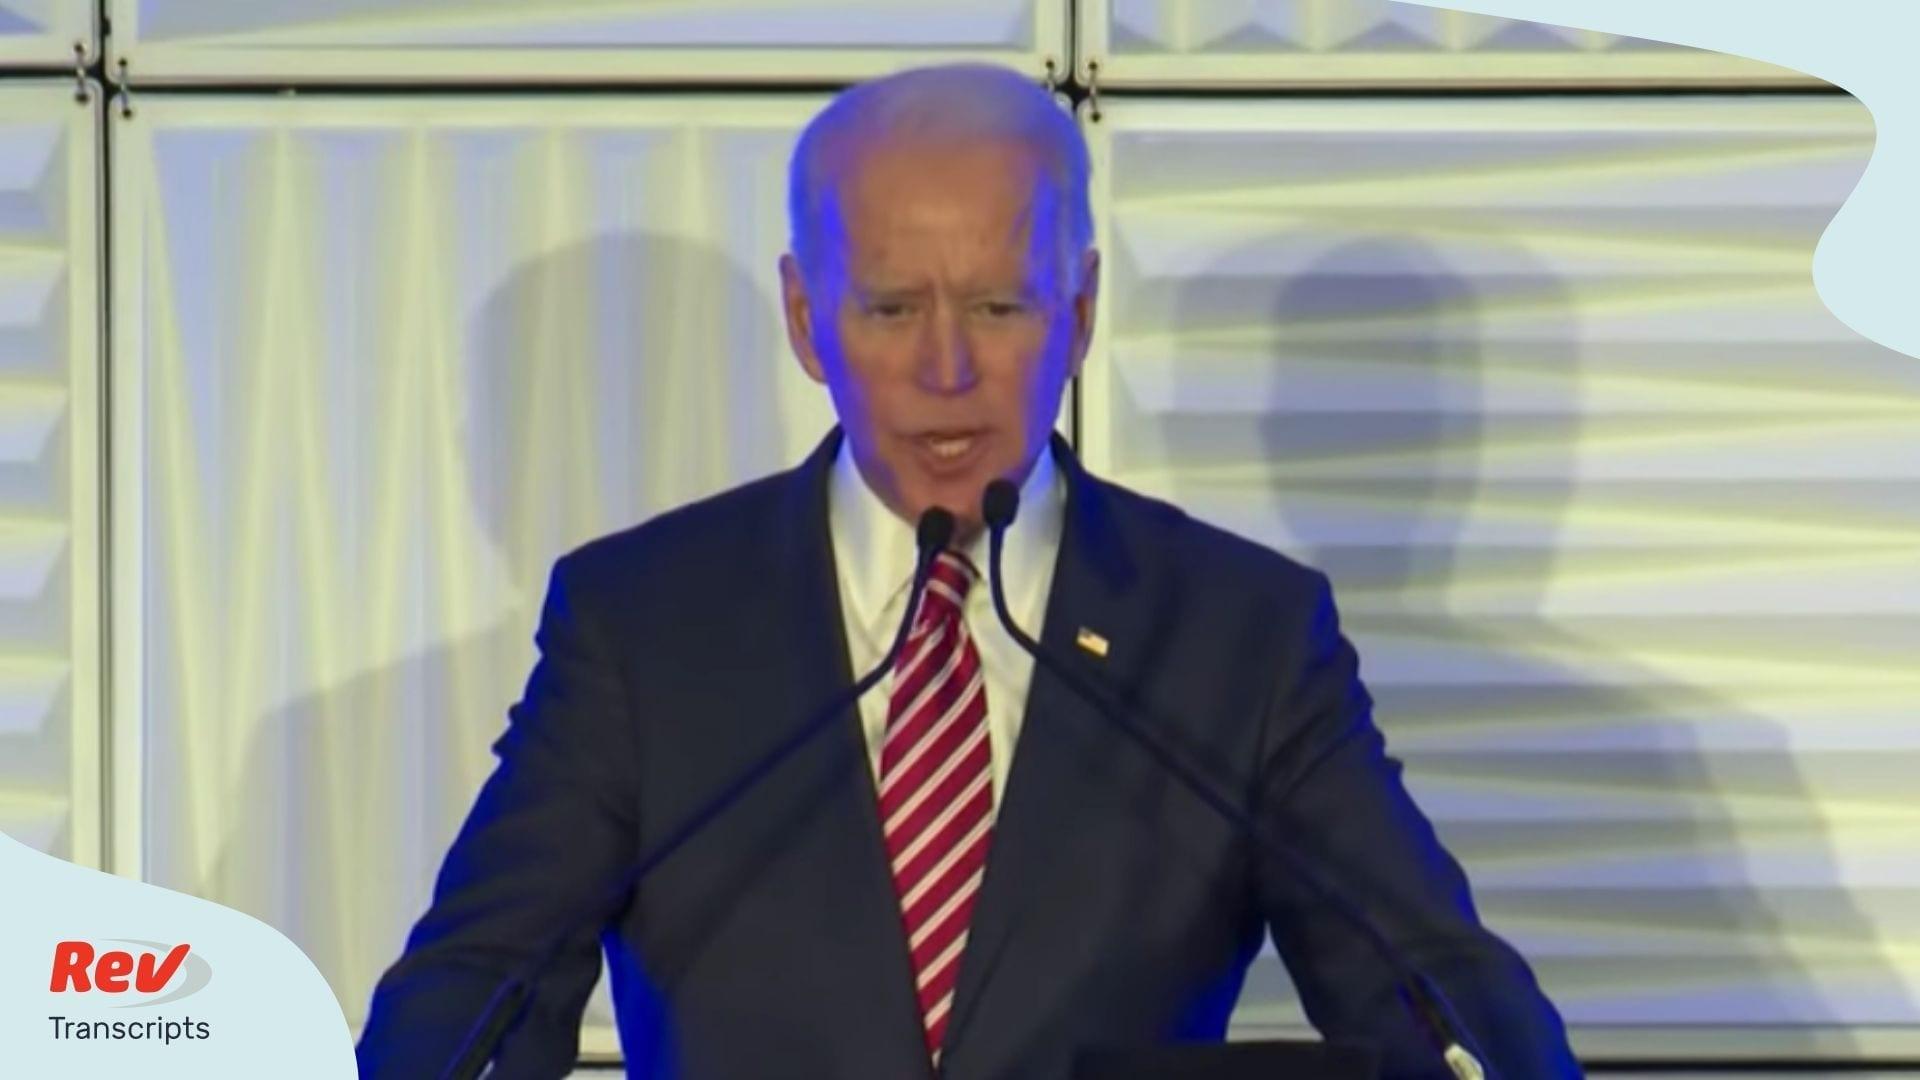 Joe Biden Mistake Says Running for Senate South Carolina Transcript